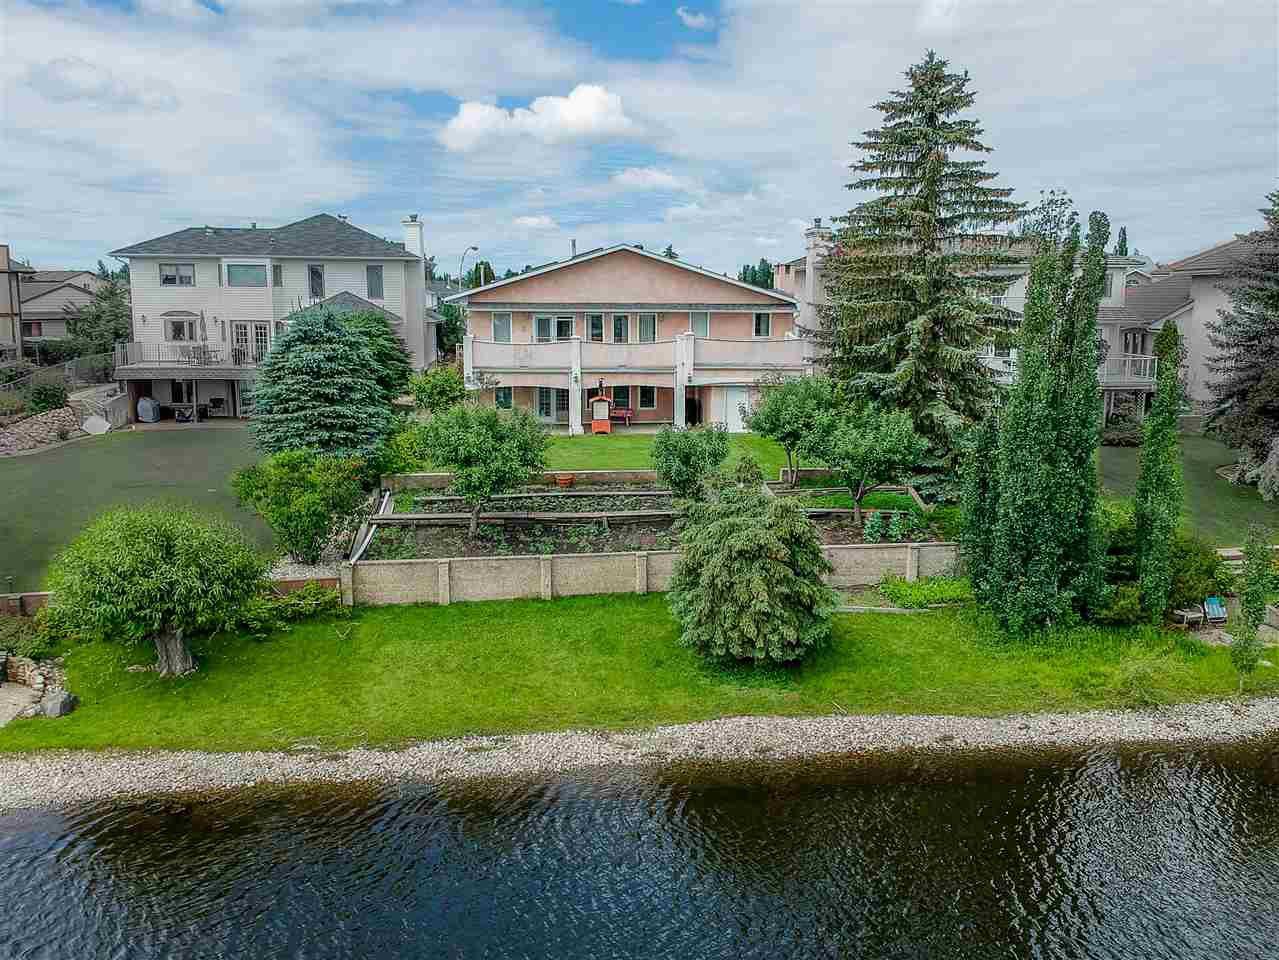 Main Photo: 15711 77 Street in Edmonton: Zone 28 House for sale : MLS®# E4163913